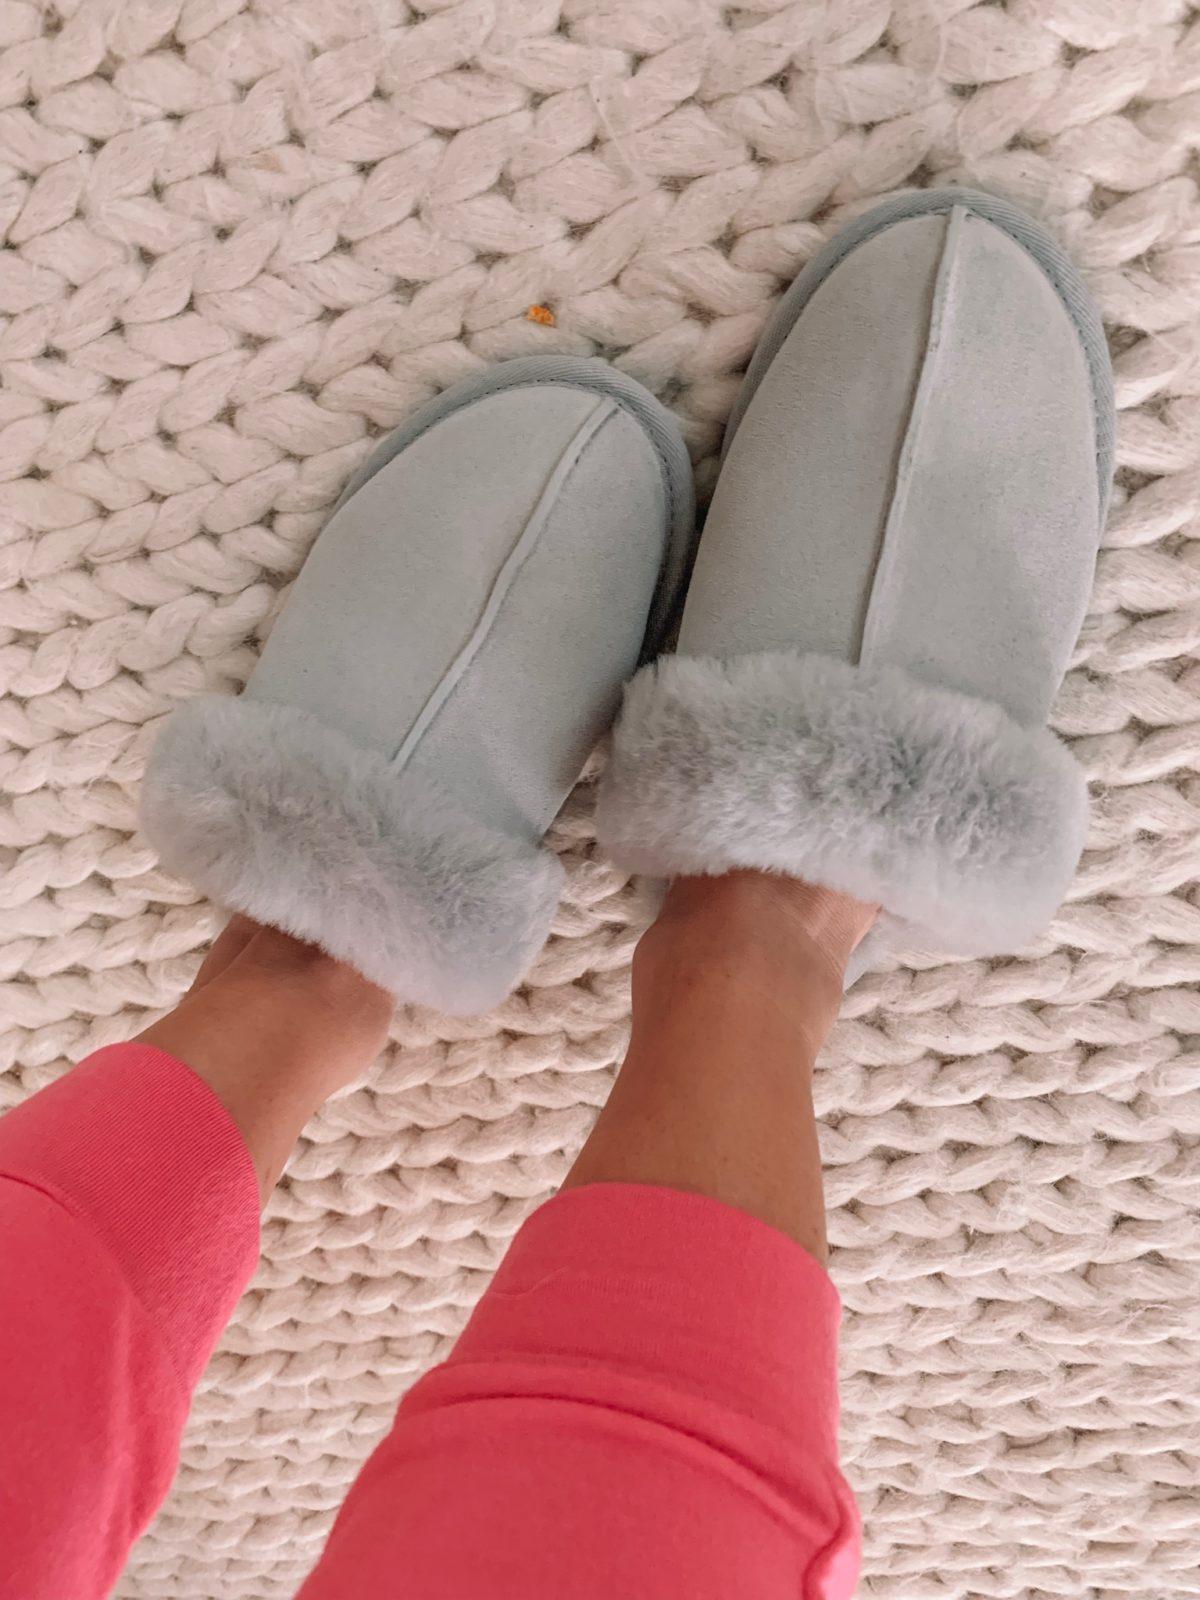 Dressing Room - ugg slippers